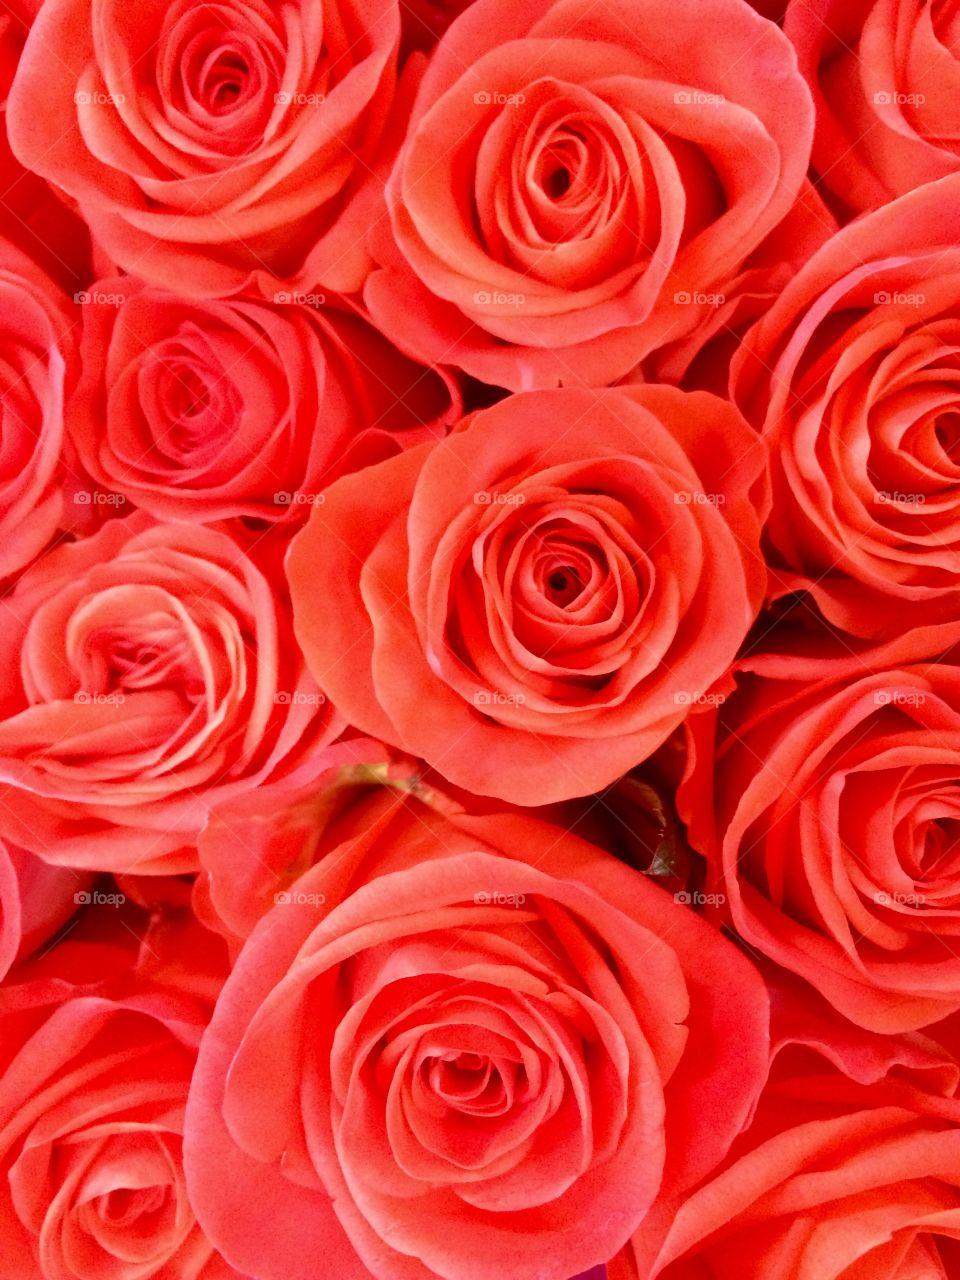 Full frame of beautiful red roses